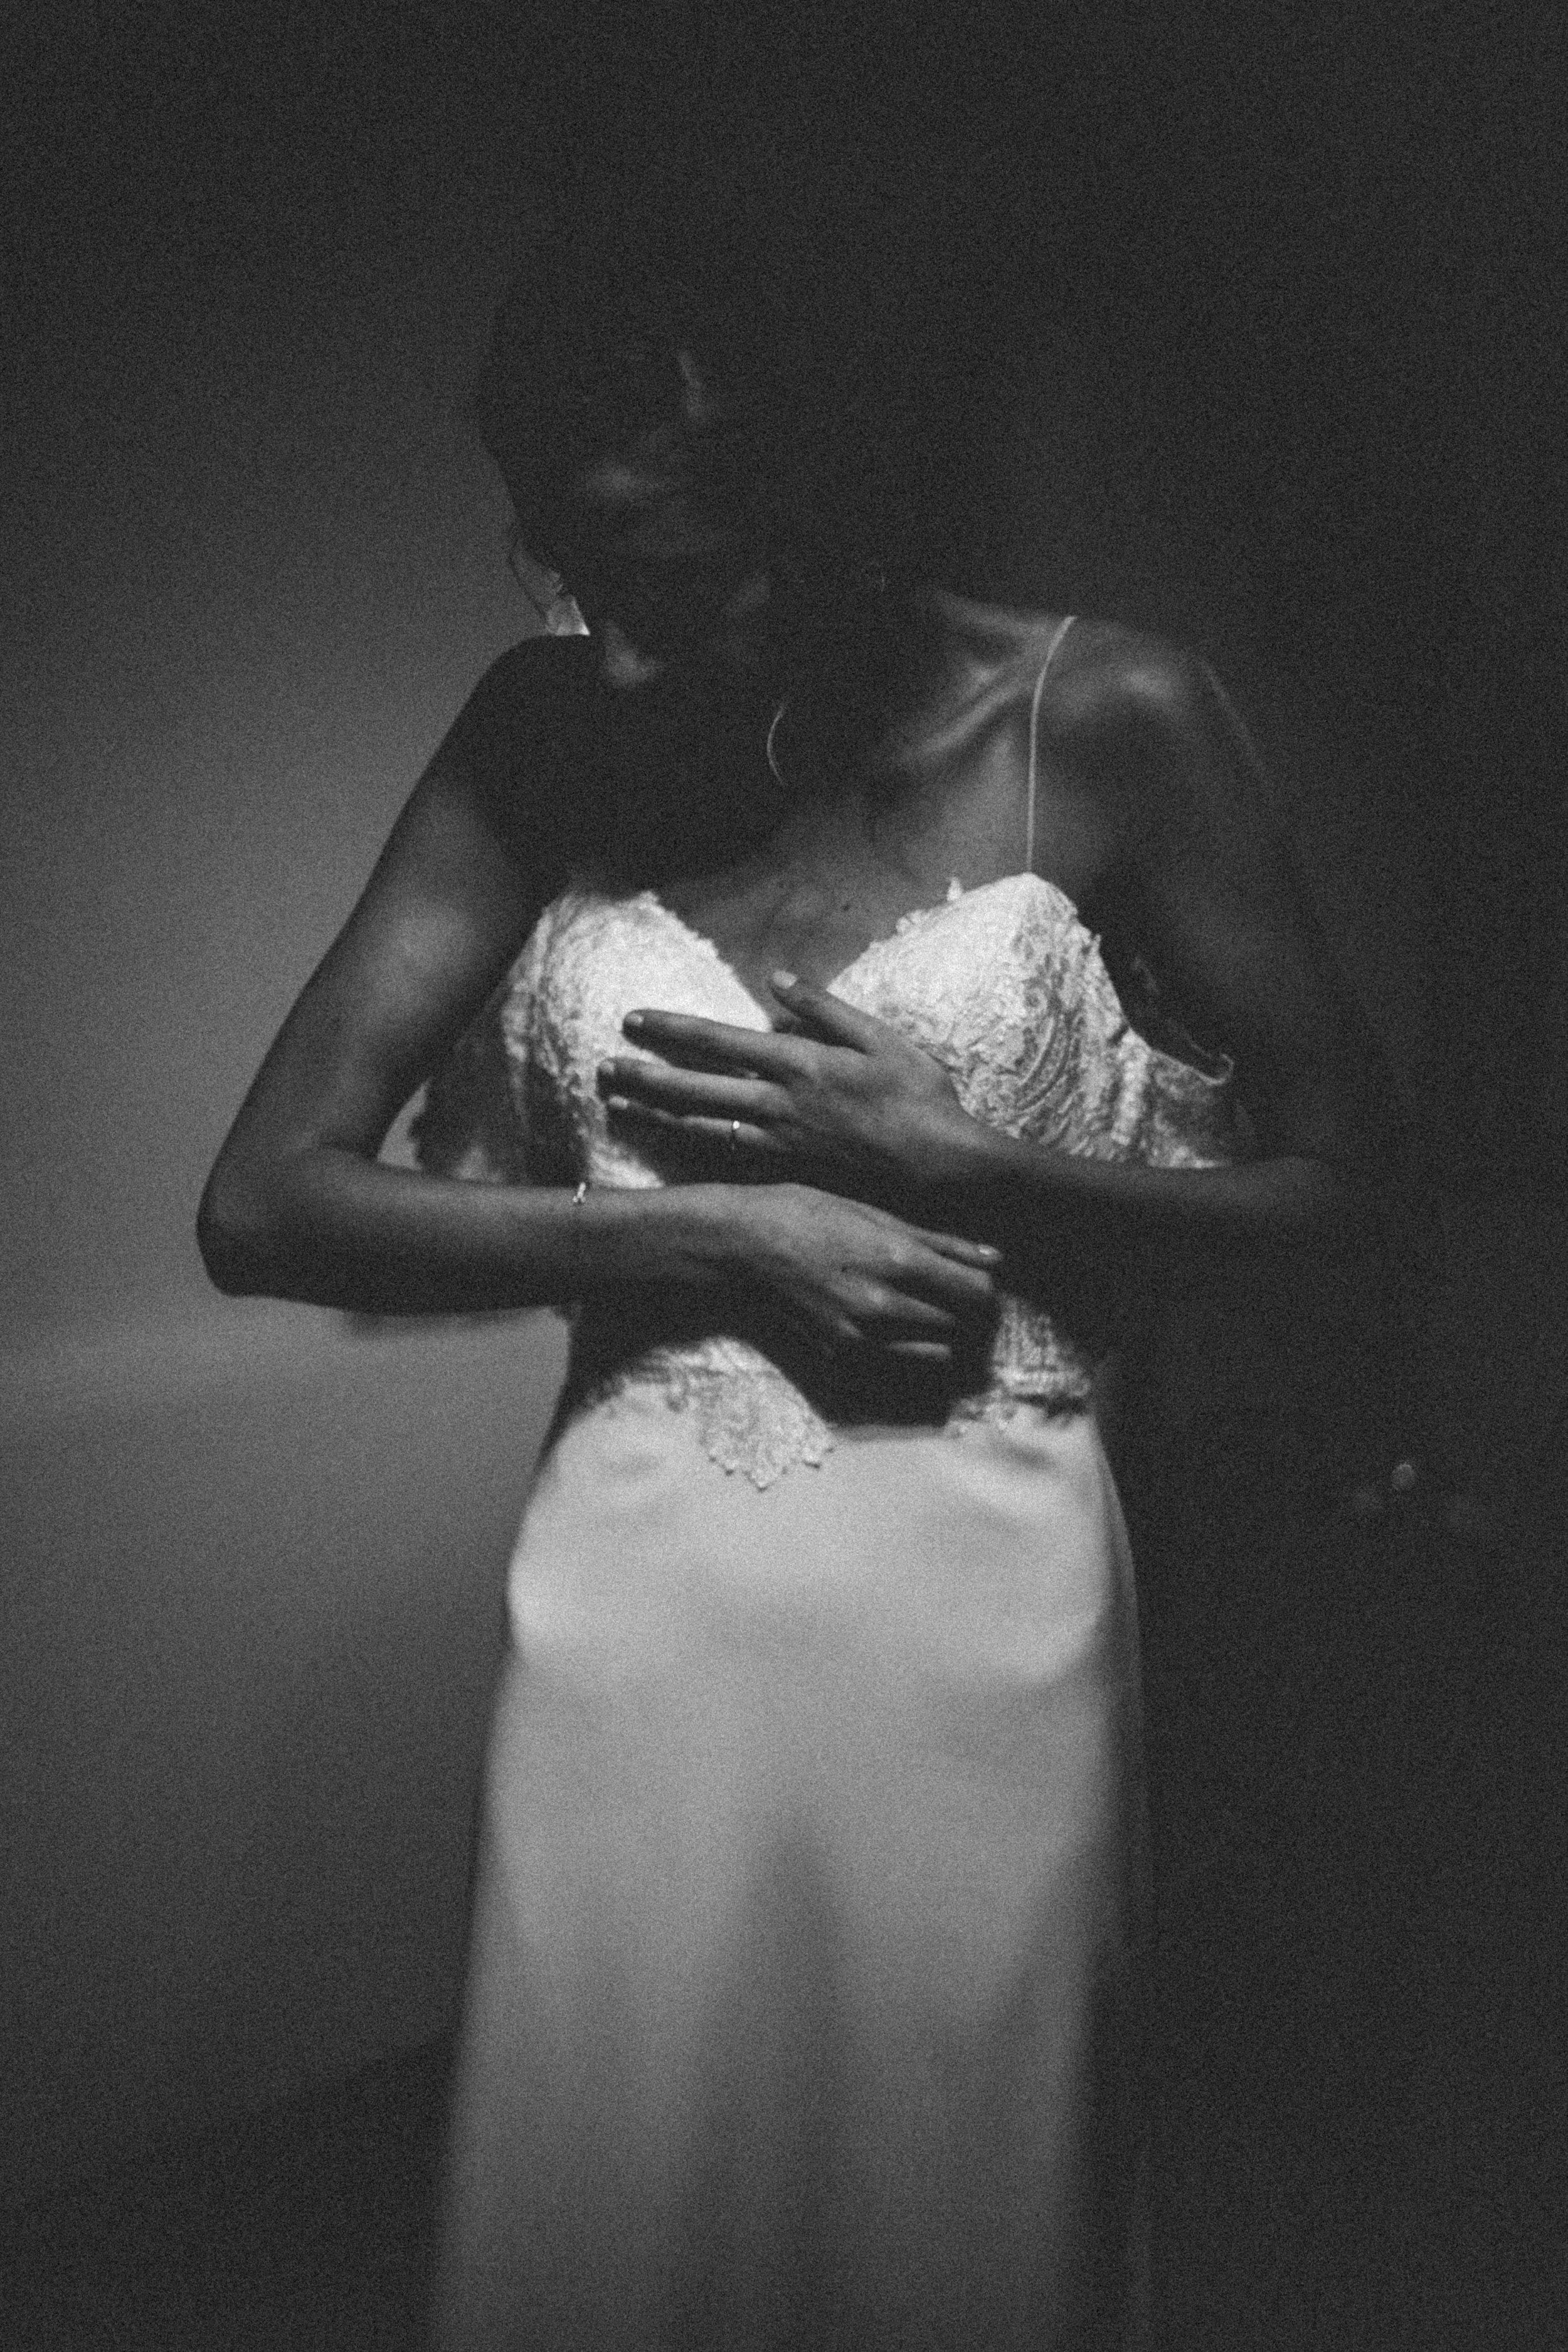 MichaelaDanielLincolnWedding_MadeiraCreativePhotography-4.jpg